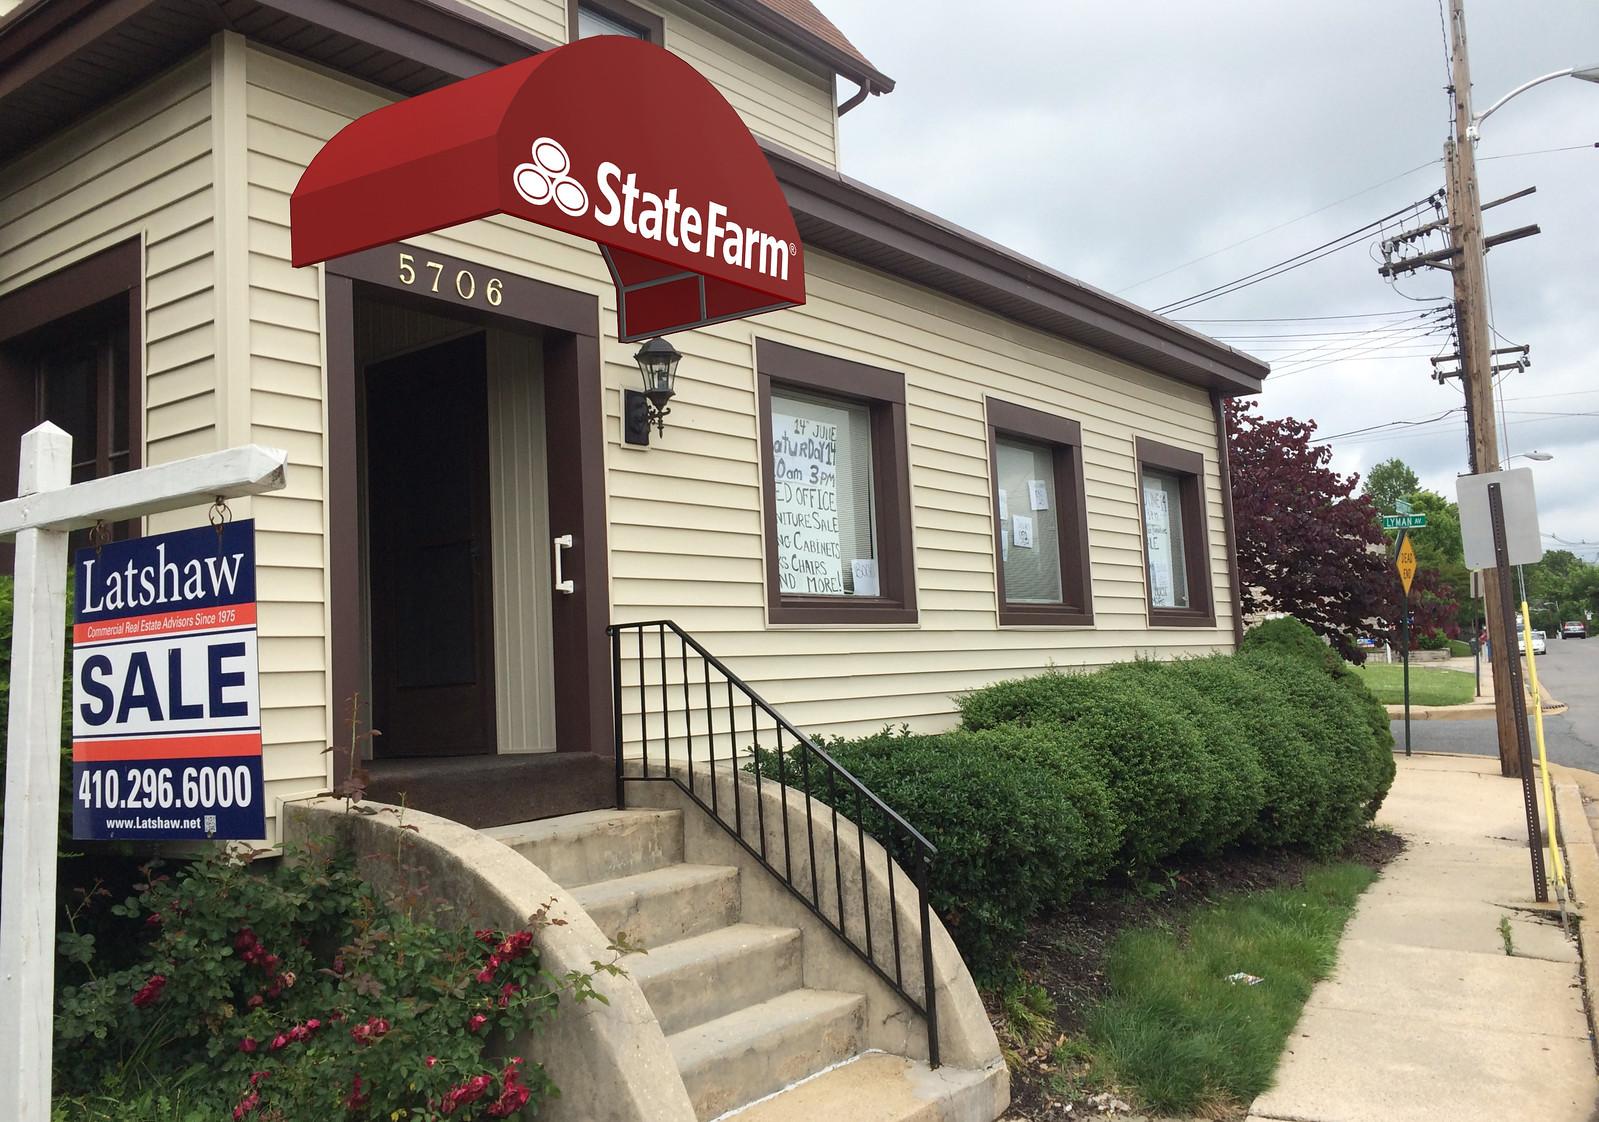 State Farm Awning Rendering